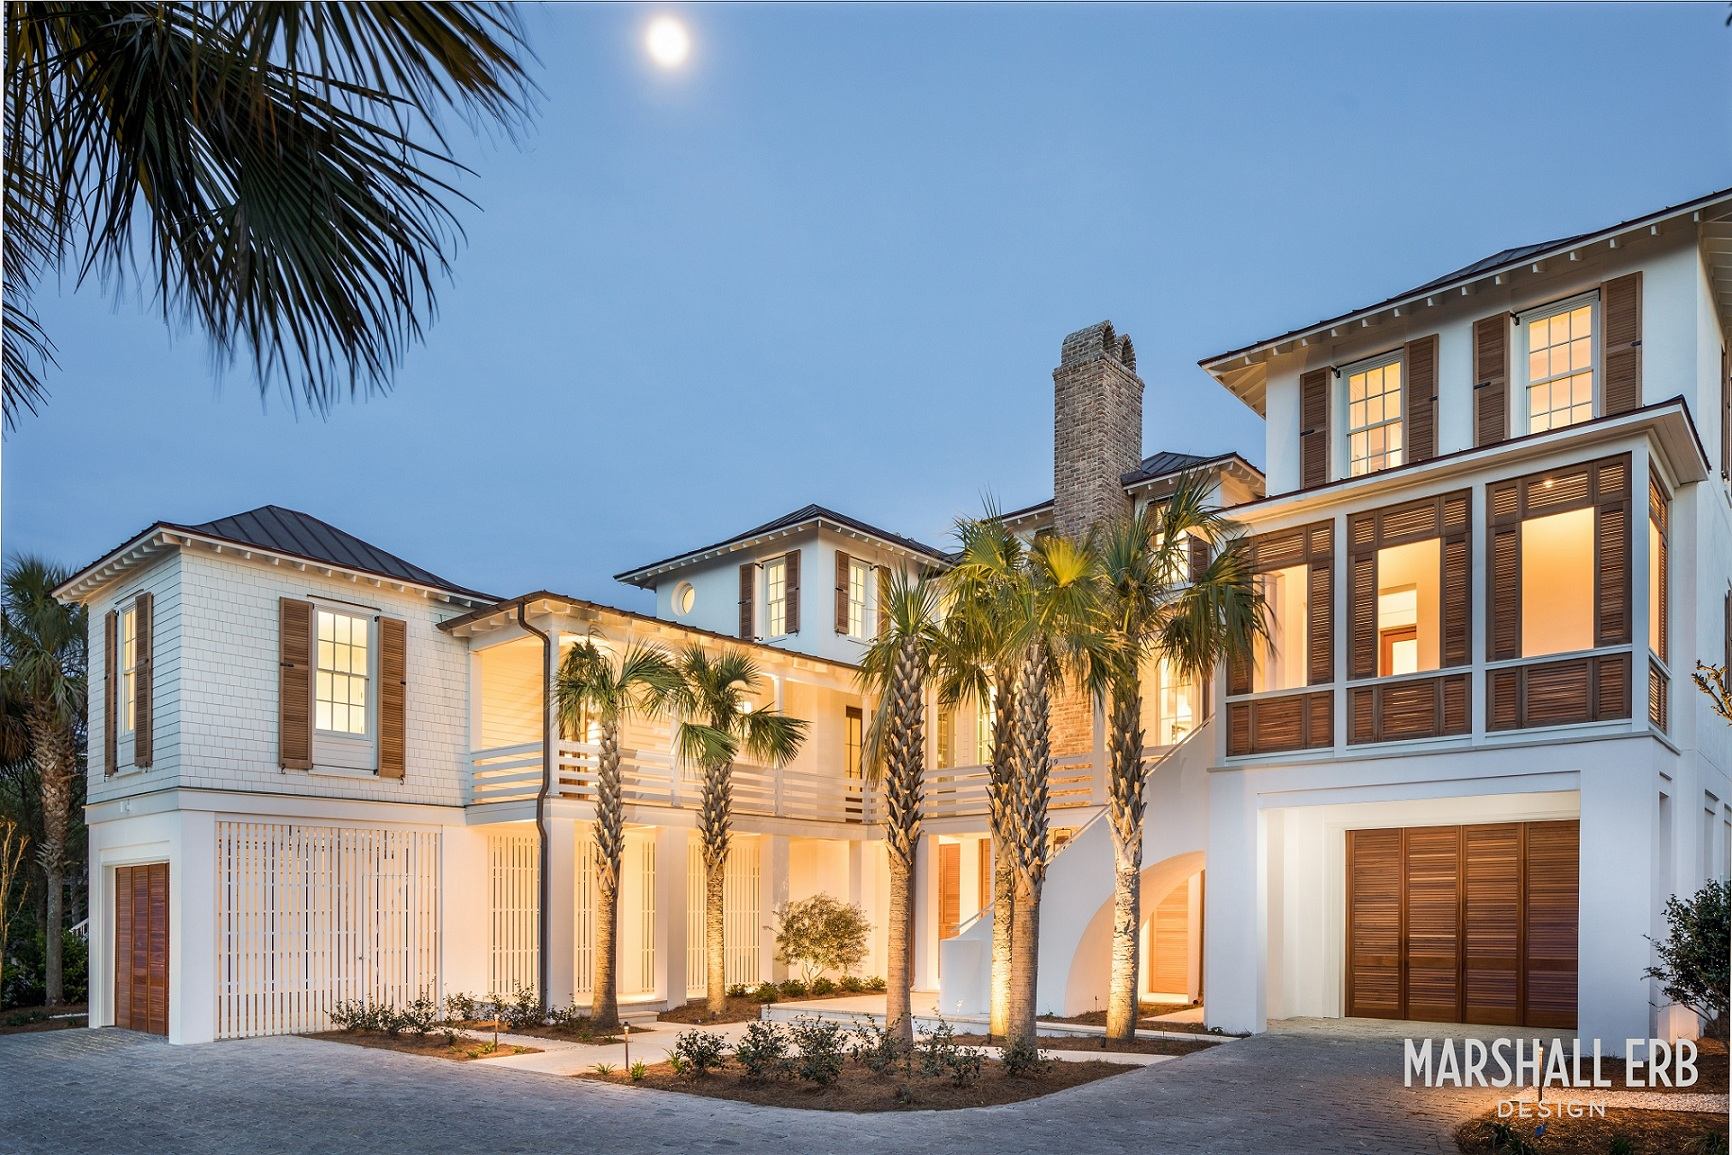 Marshall-Erb-Design-Beach-House-Exterior